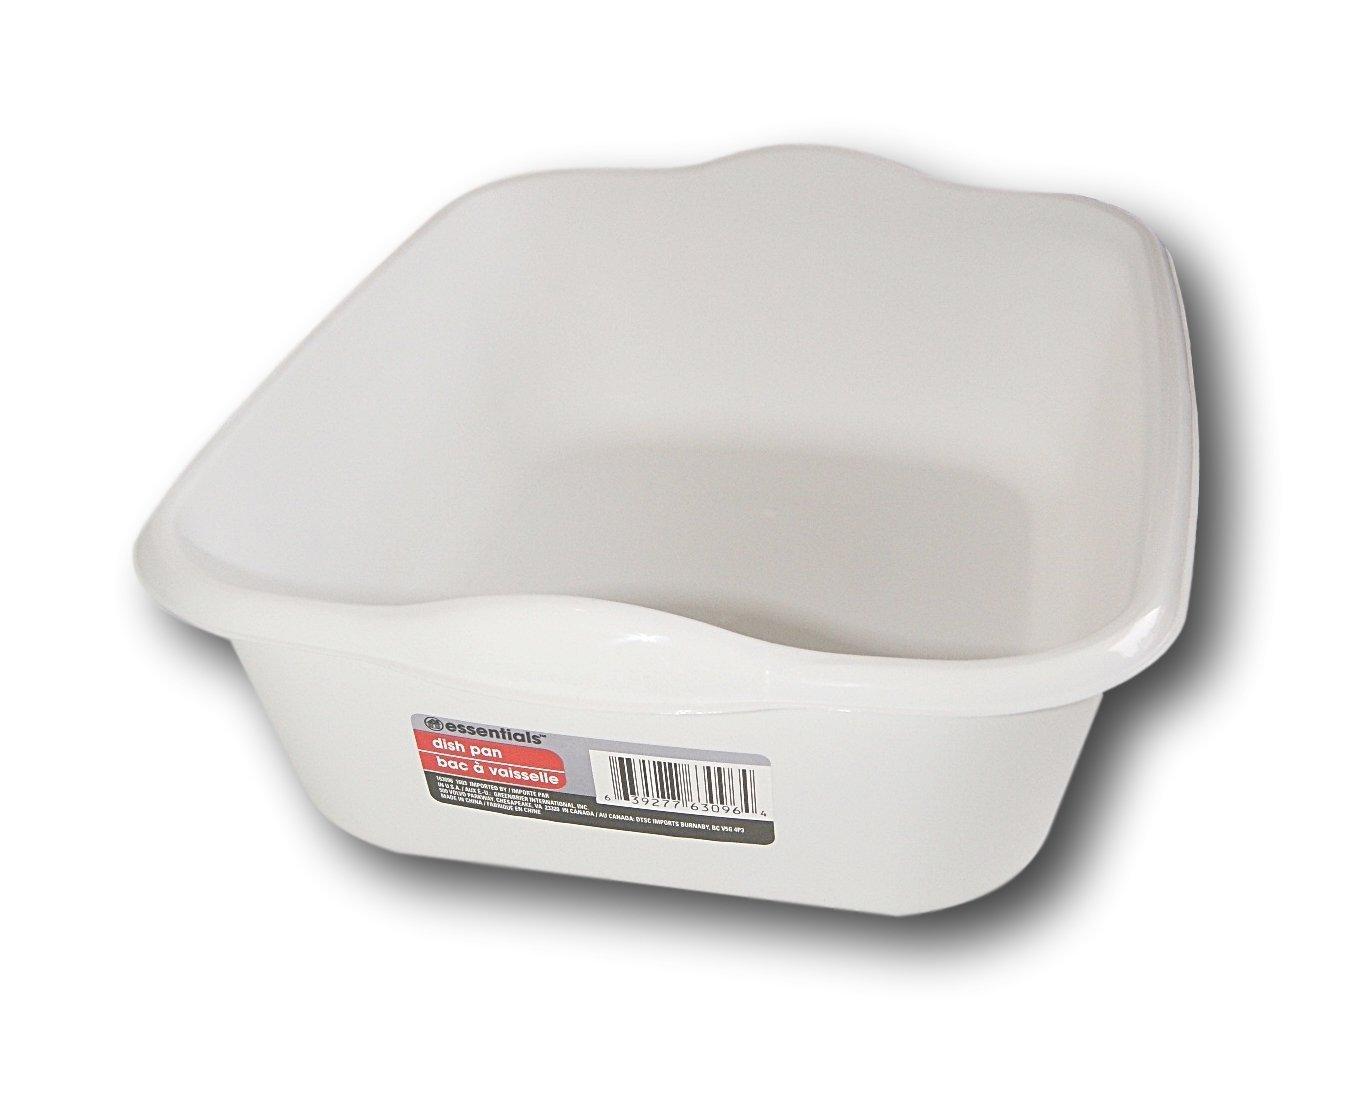 "Essentials White Plastic Eight Quart Dishpan - 13½'' x 11'' x 4½""H"